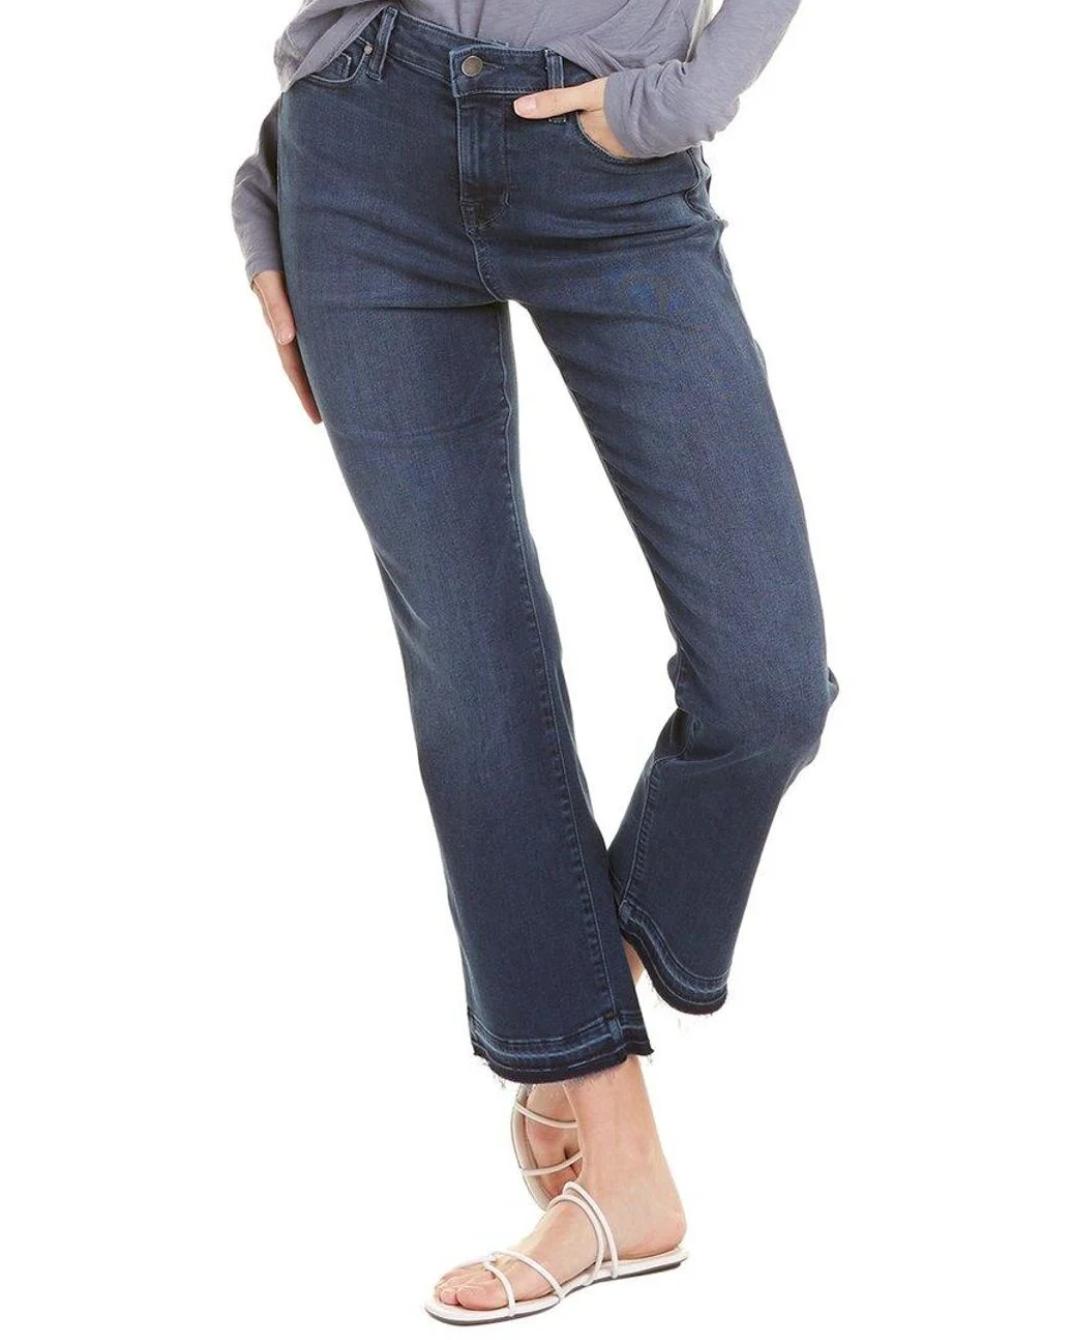 fidelity jeans denim Blue Hayden Ballistic Crop Flare Leg Jean - Fidelity Jeans - Die mit den Goldnieten